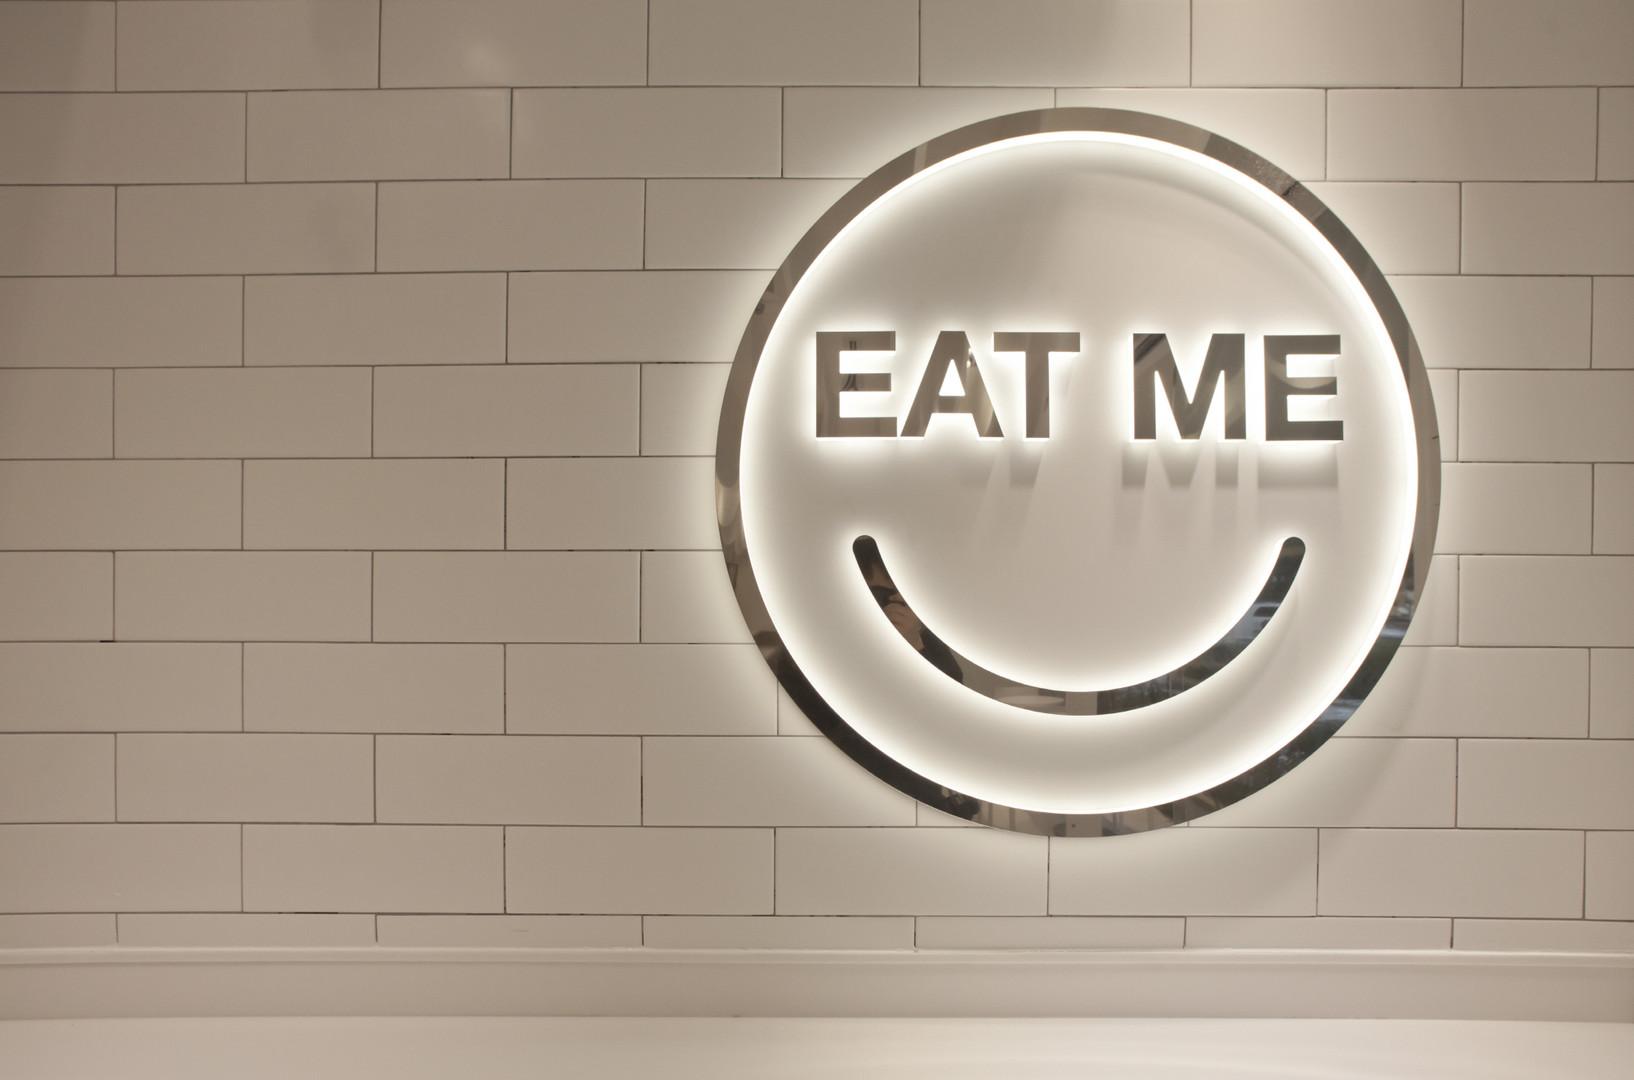 mootaa-eatme-007.jpg